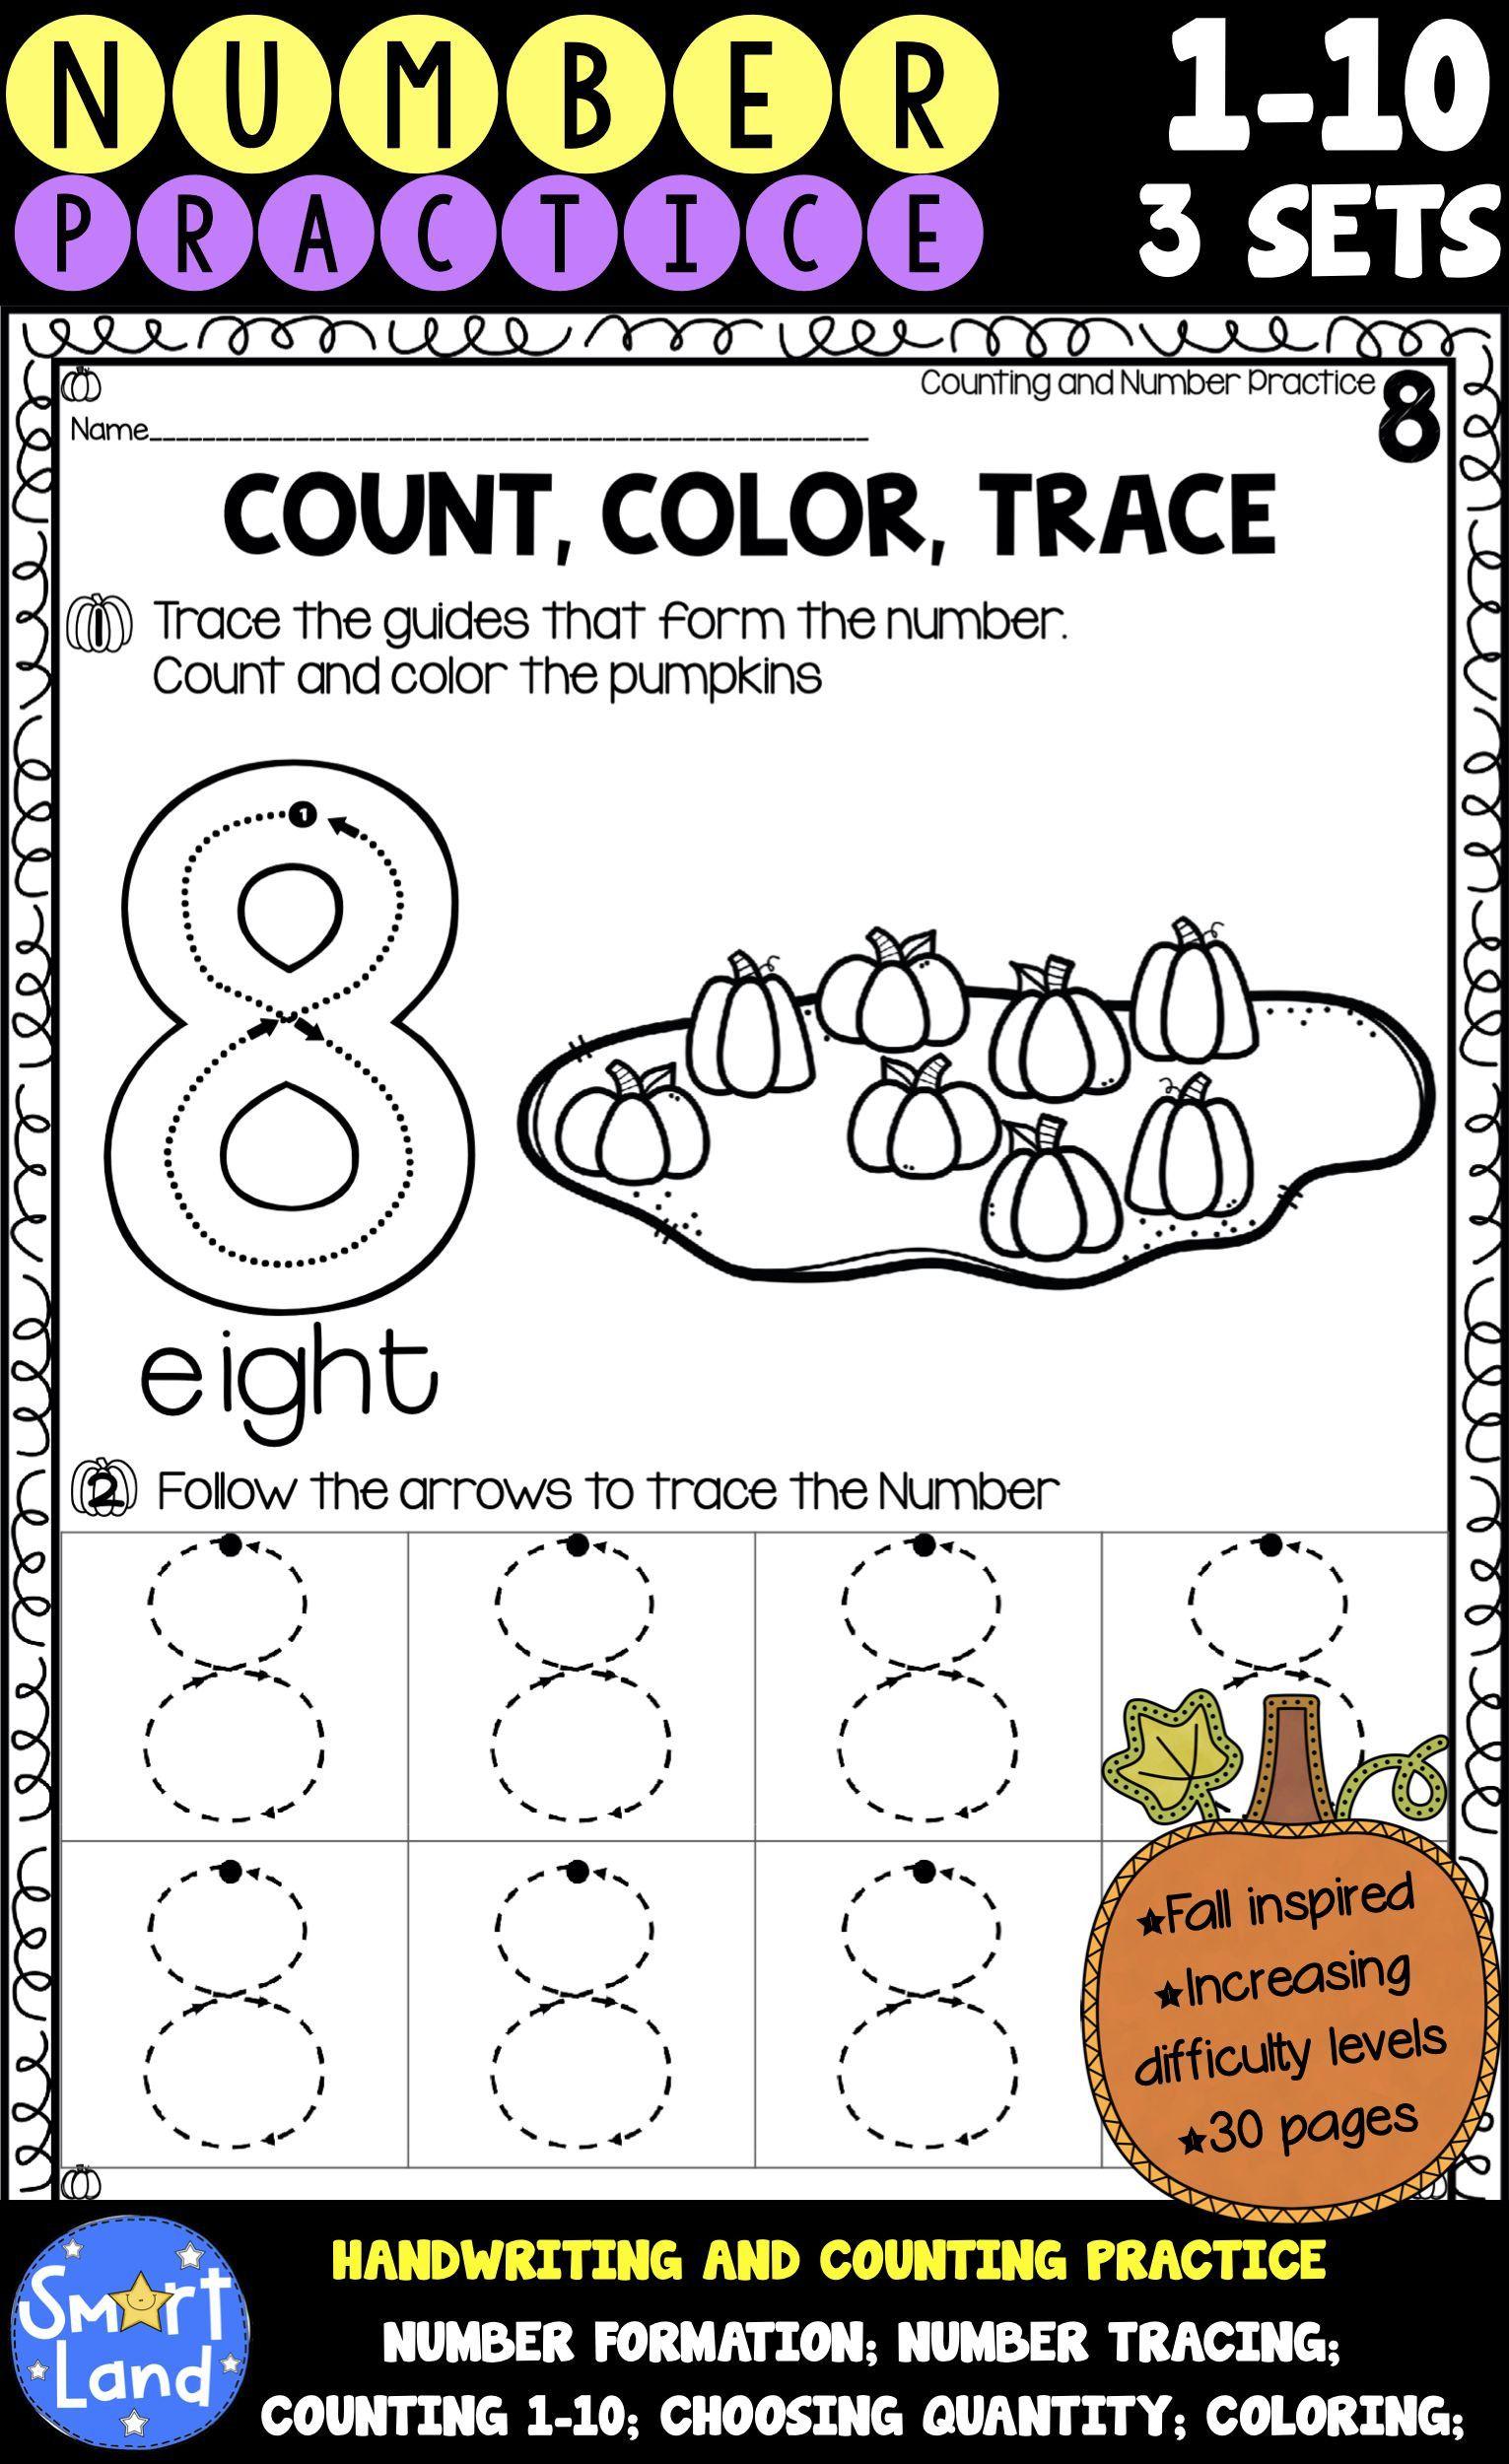 30 Worksheets Count And Color Part 3 Reginald Penhorst